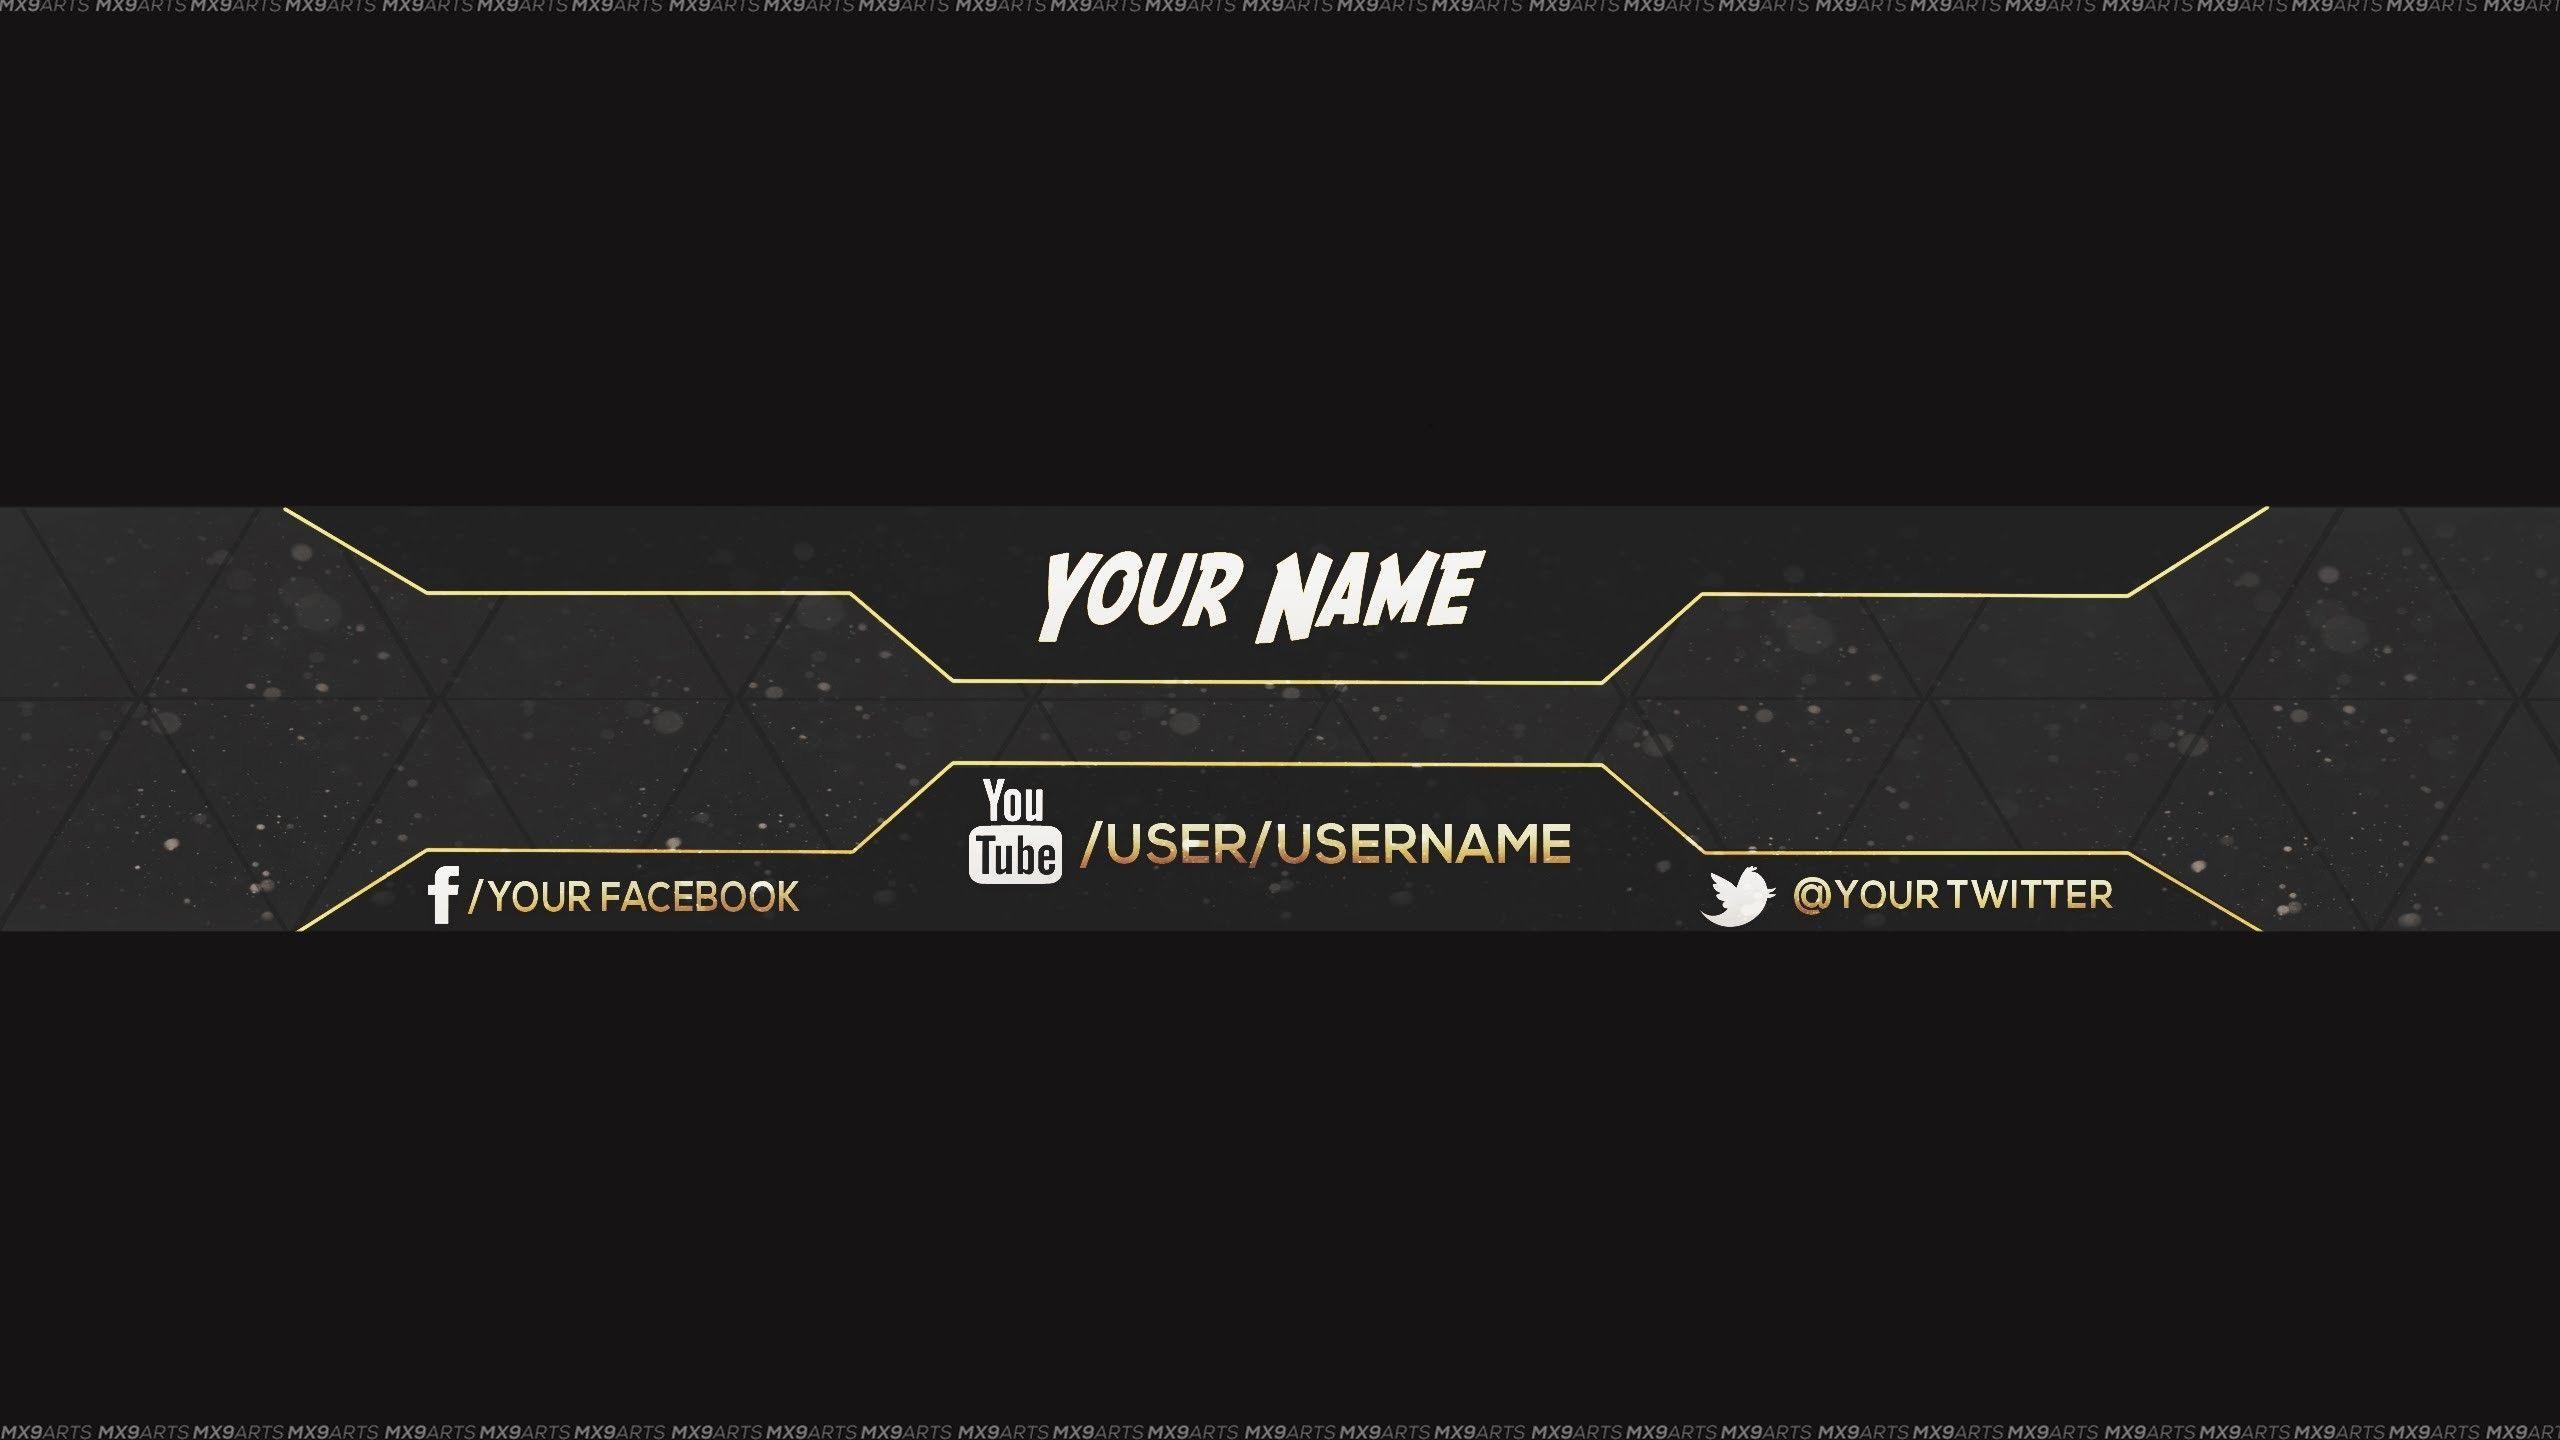 Res 2560x1440 Reupload Free Amazing Youtube Channel Banner Template 5 Dir 2560x1440 Ama En 2020 Portada De Youtube Cabeceras Para Youtube Fotos Para Youtube